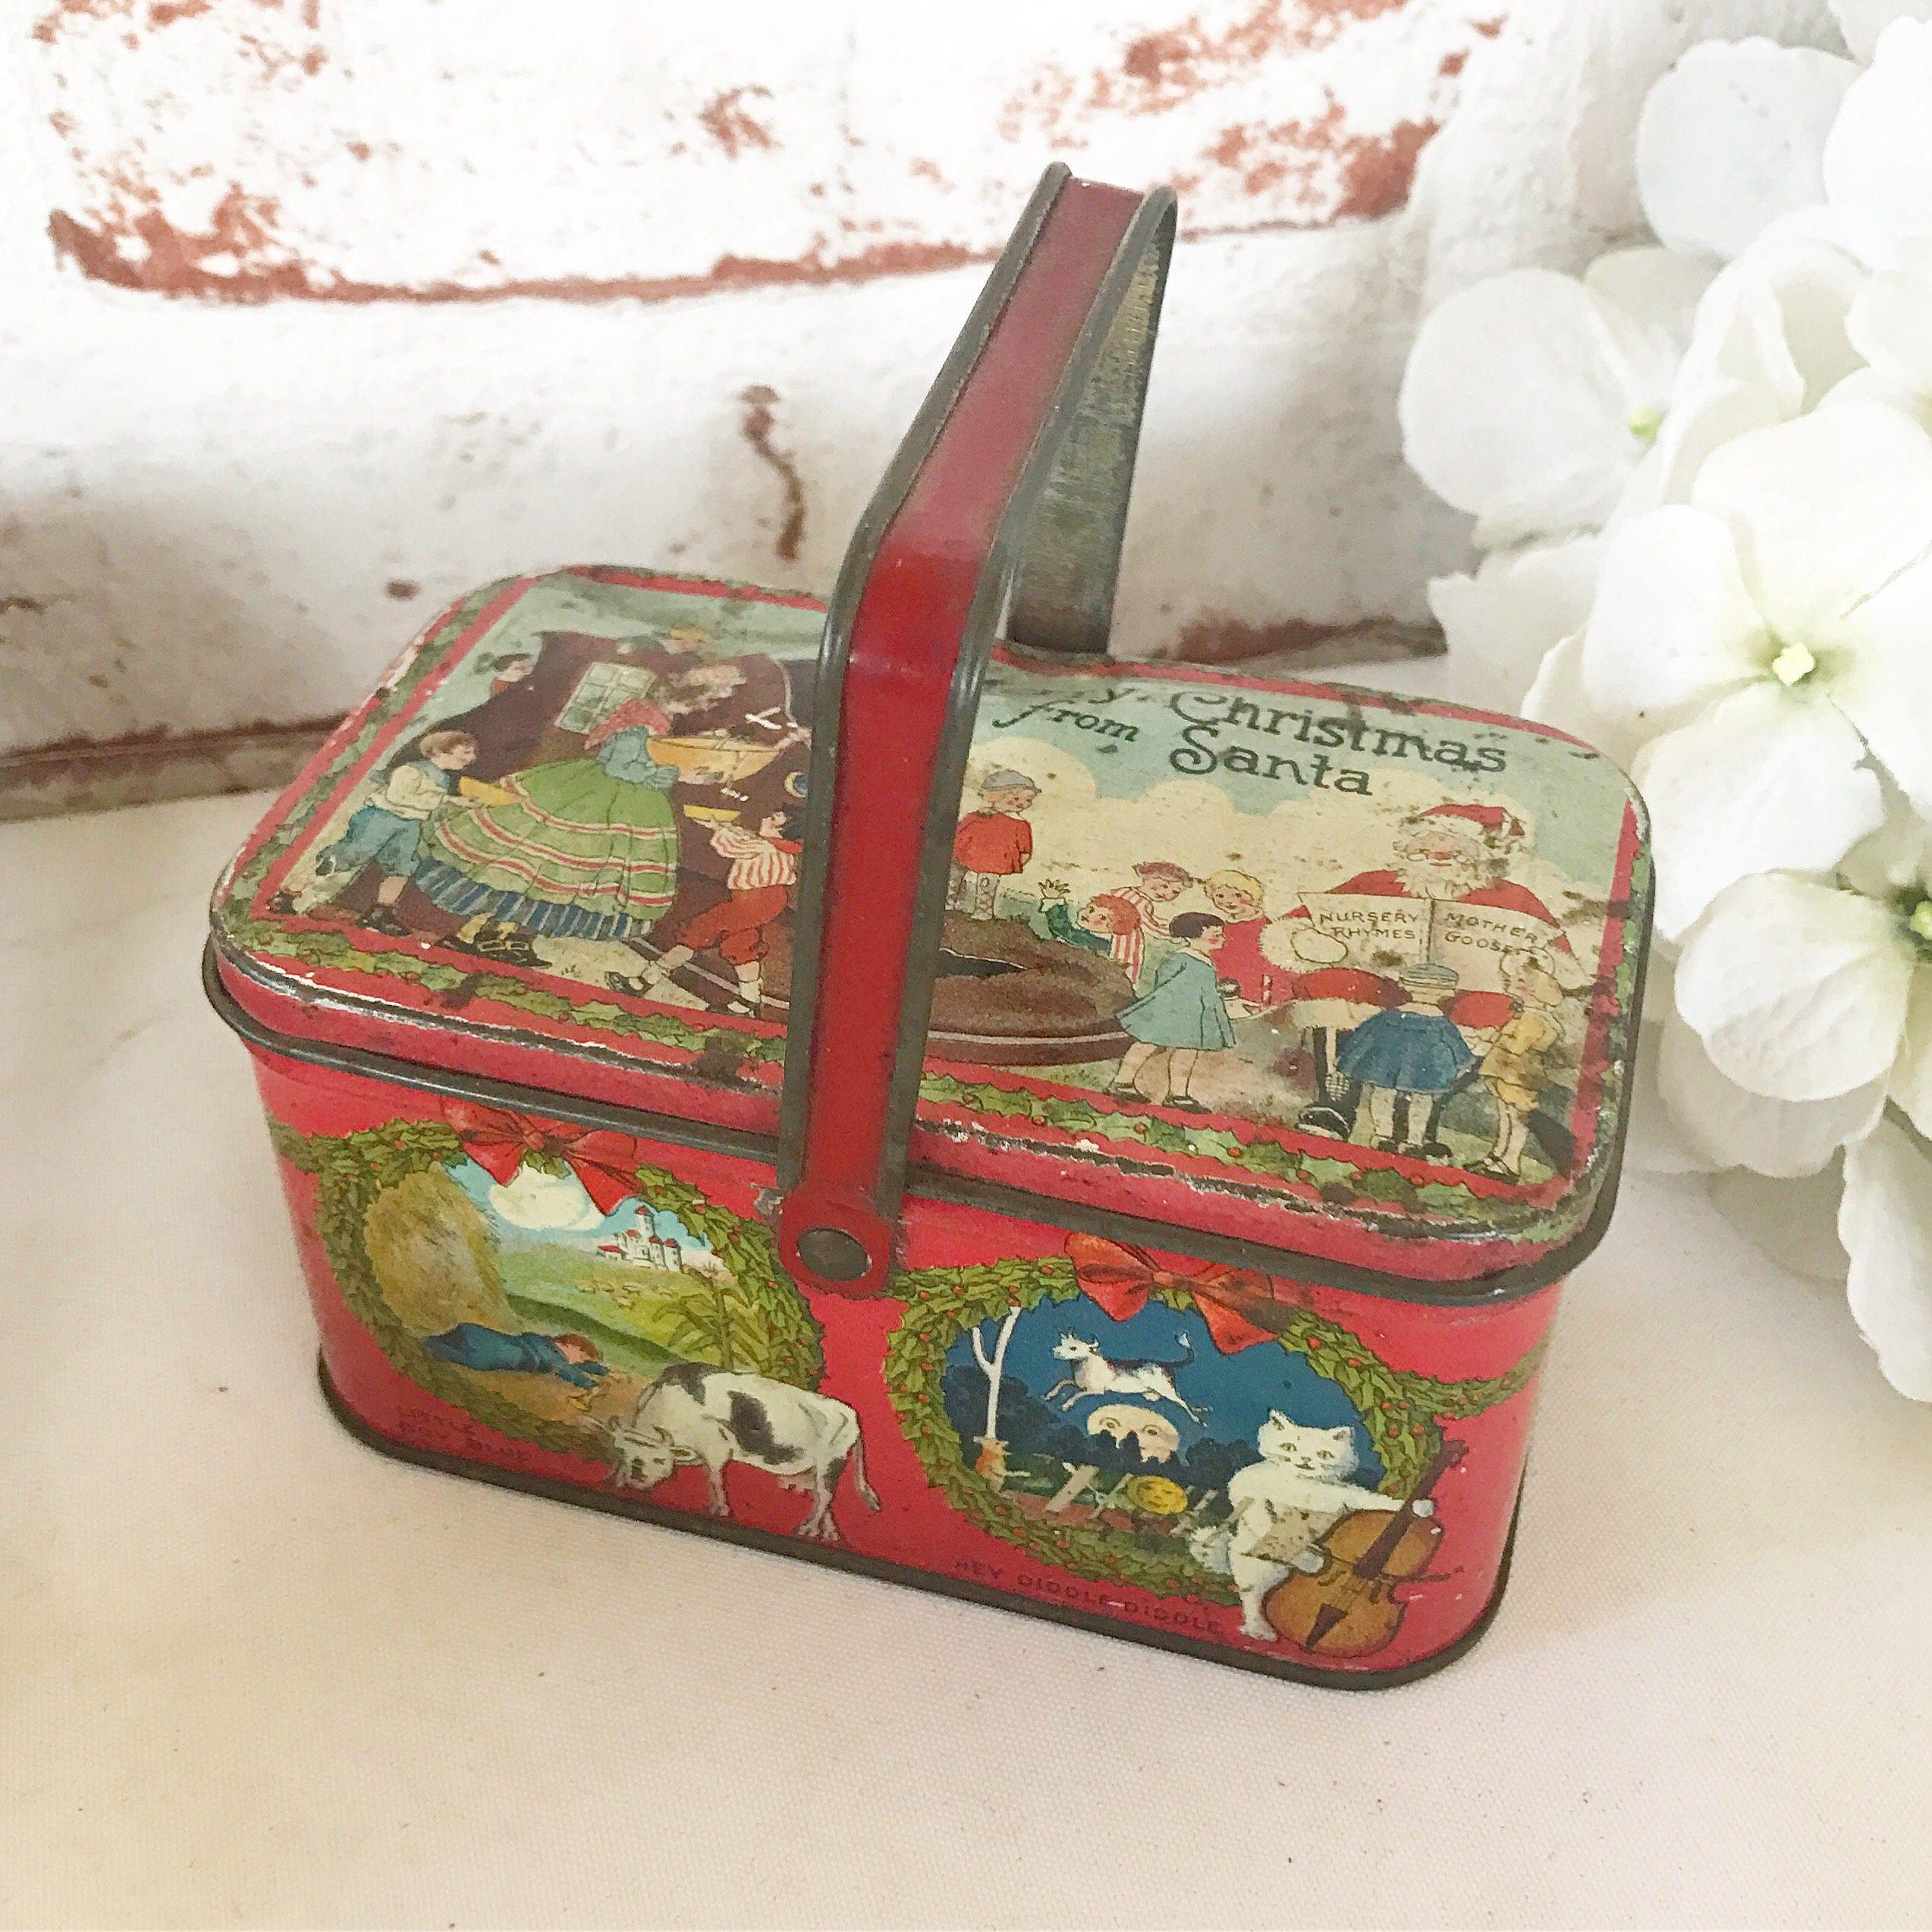 Rare antique santa claus christmas decorative tin litho box for Decorating tins for christmas